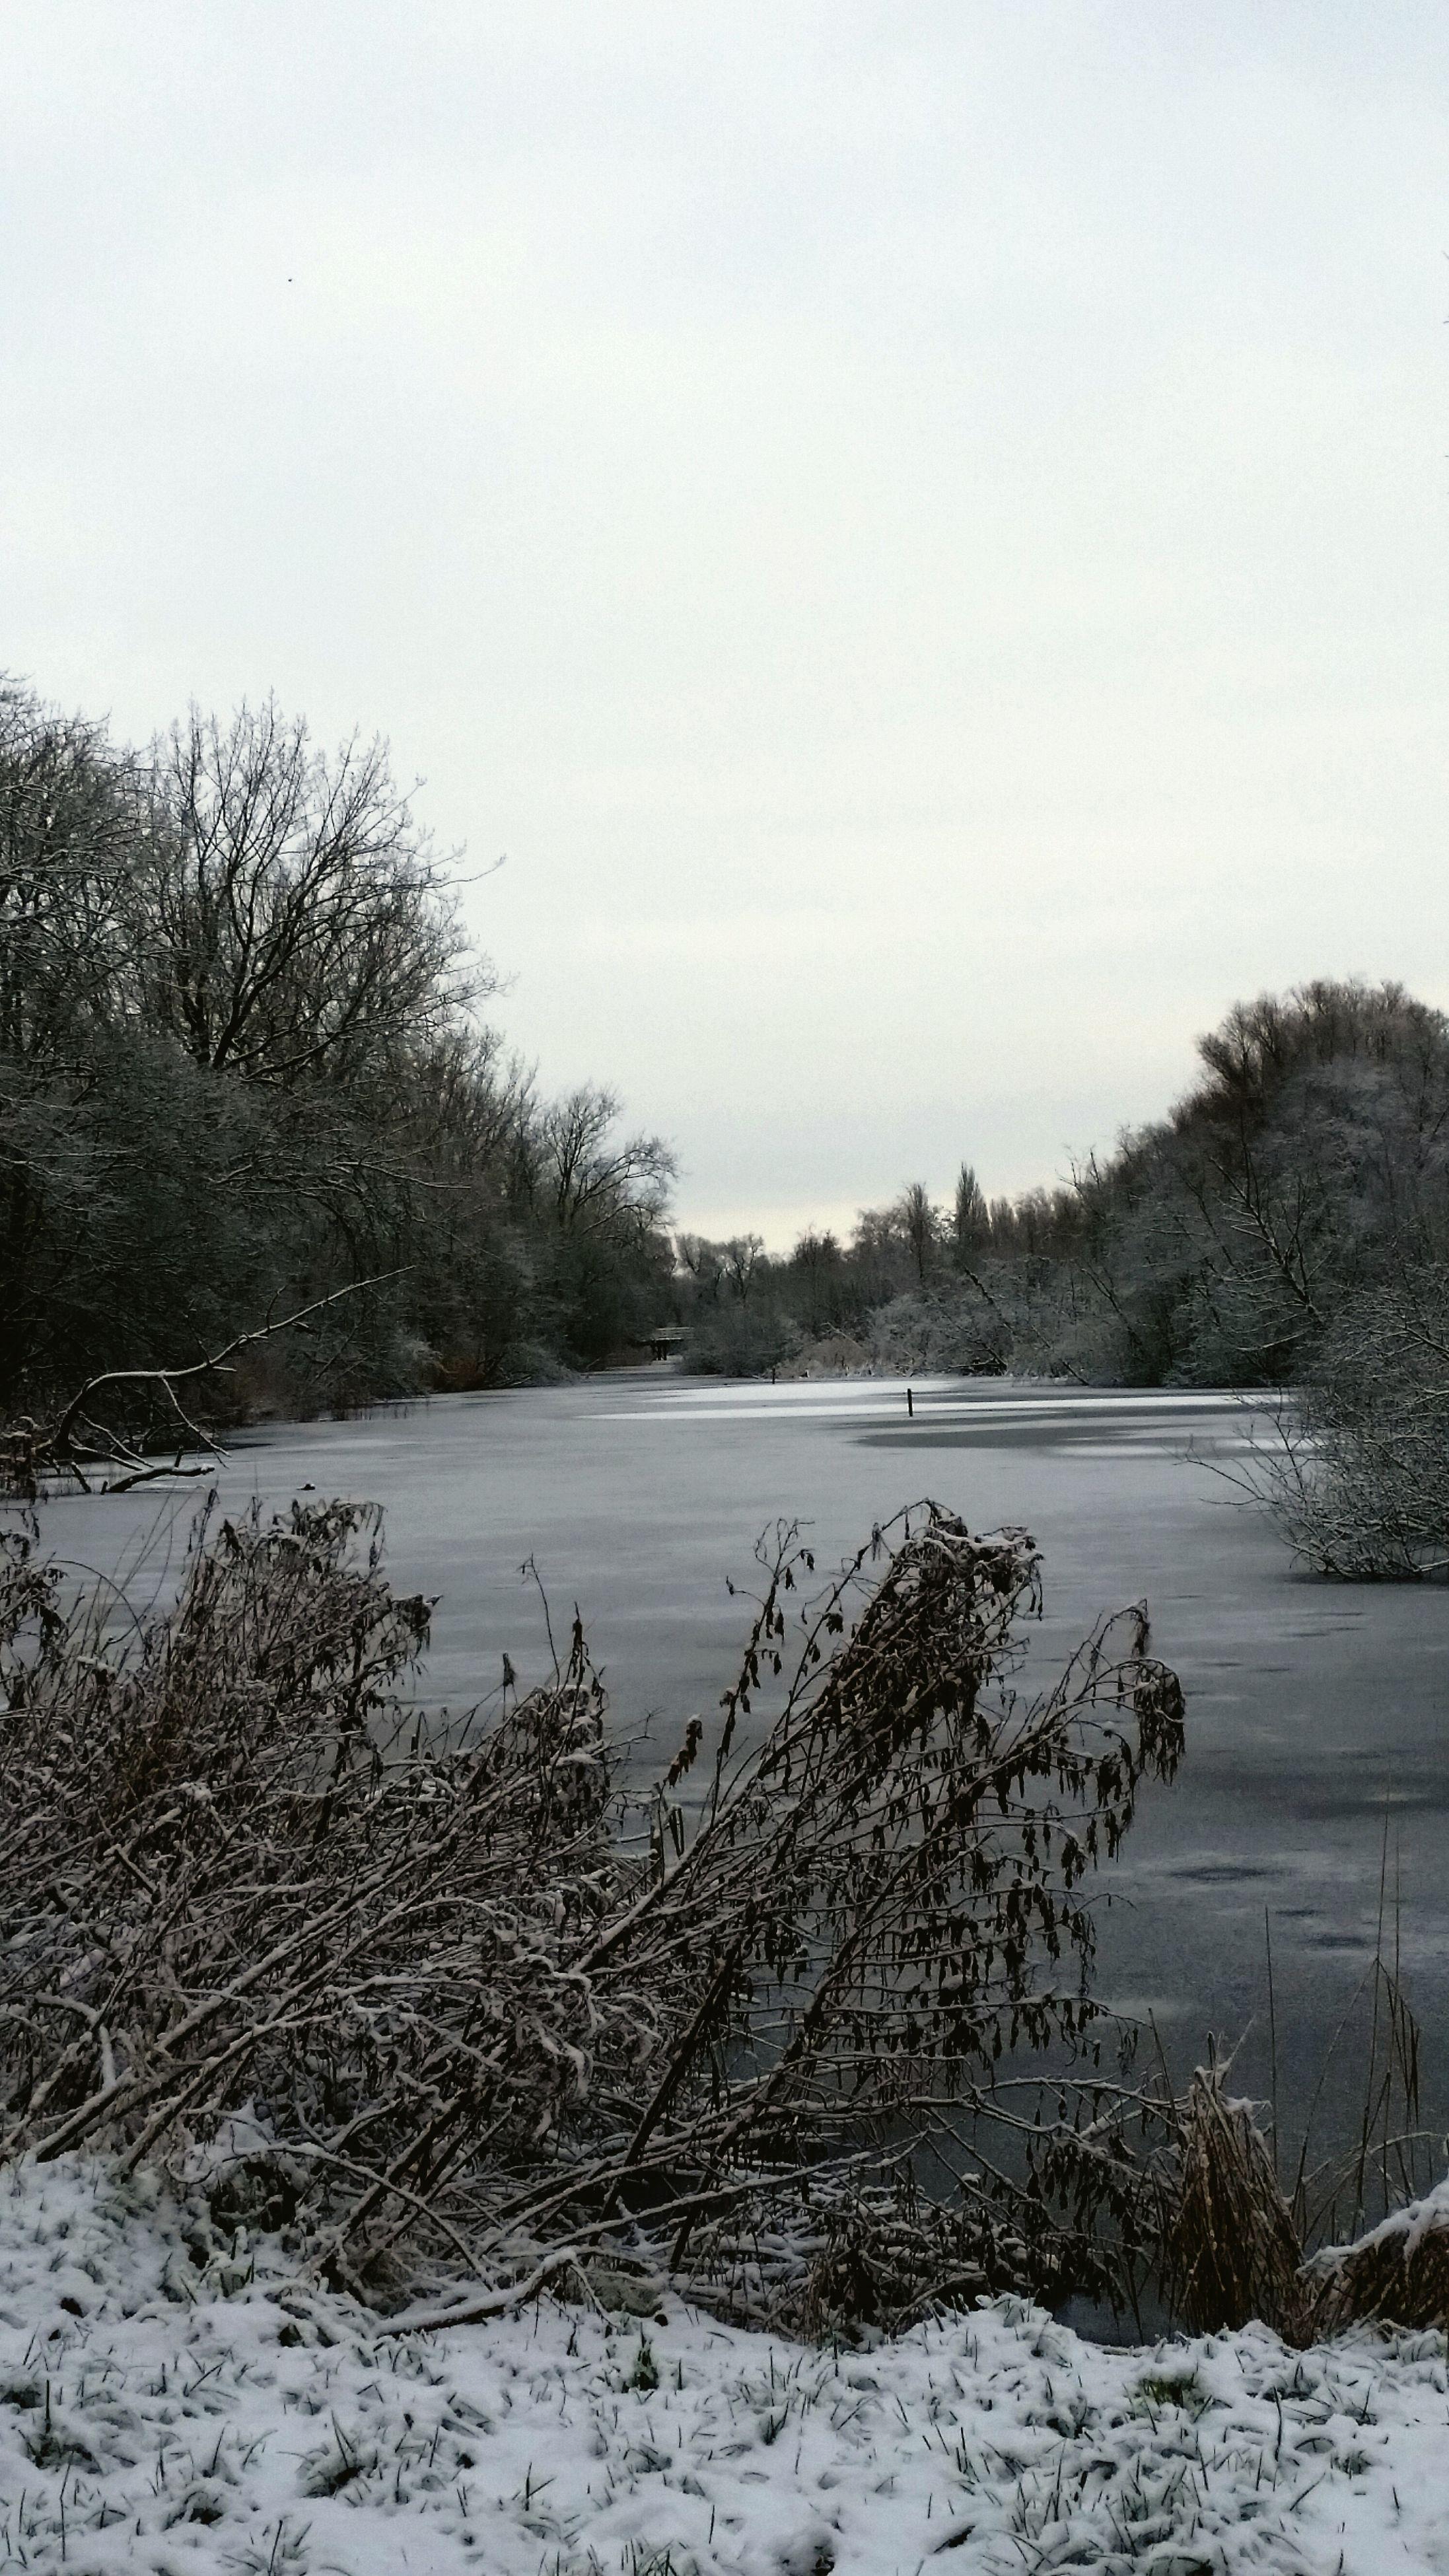 tranquil scene, tranquility, tree, lake, winter, scenics, water, snow, cold temperature, beauty in nature, nature, clear sky, landscape, sky, bare tree, non-urban scene, river, season, lakeshore, idyllic